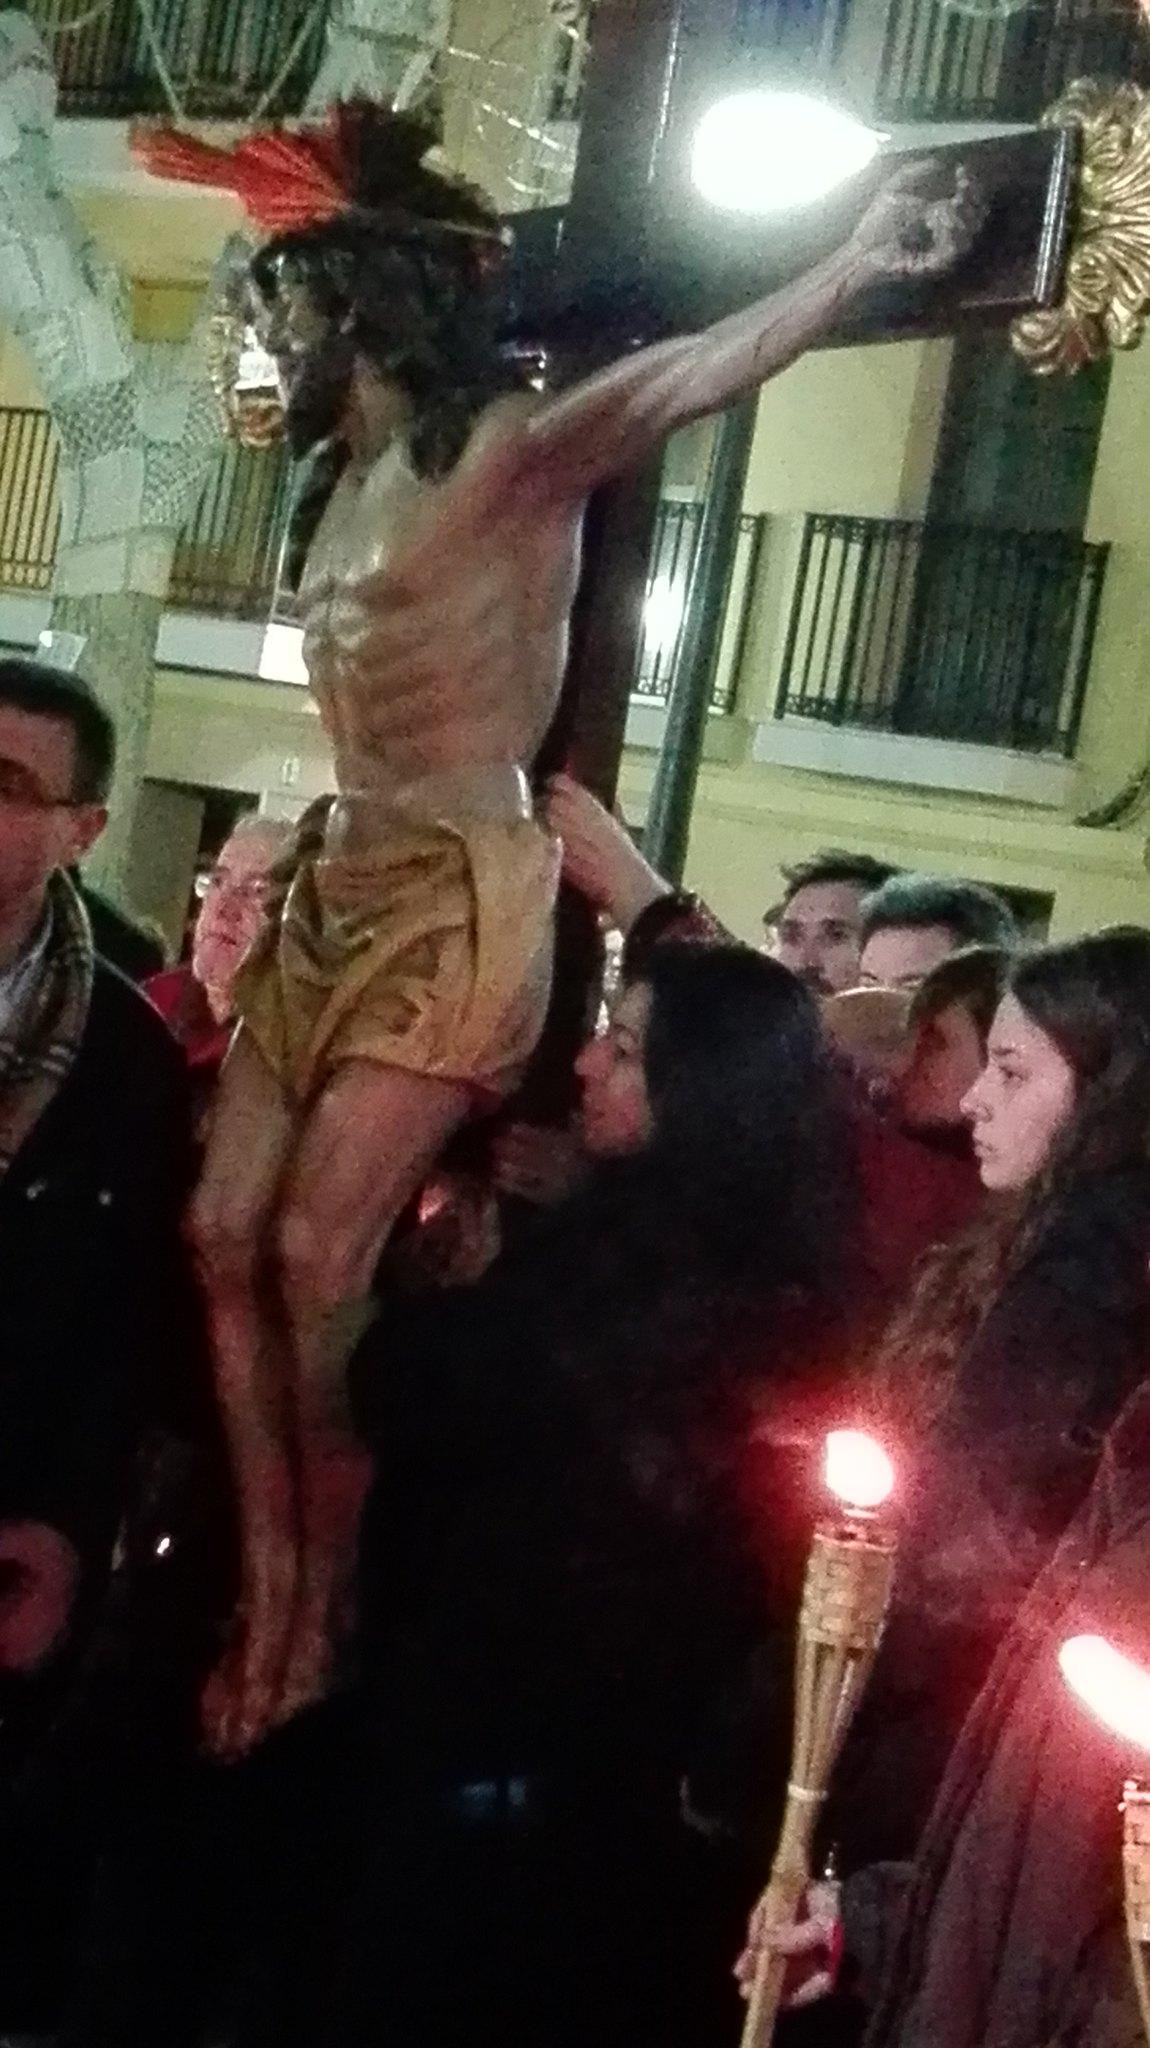 (2016-03-18) - VII Vía Crucis nocturno - Javier Romero Ripoll (070)